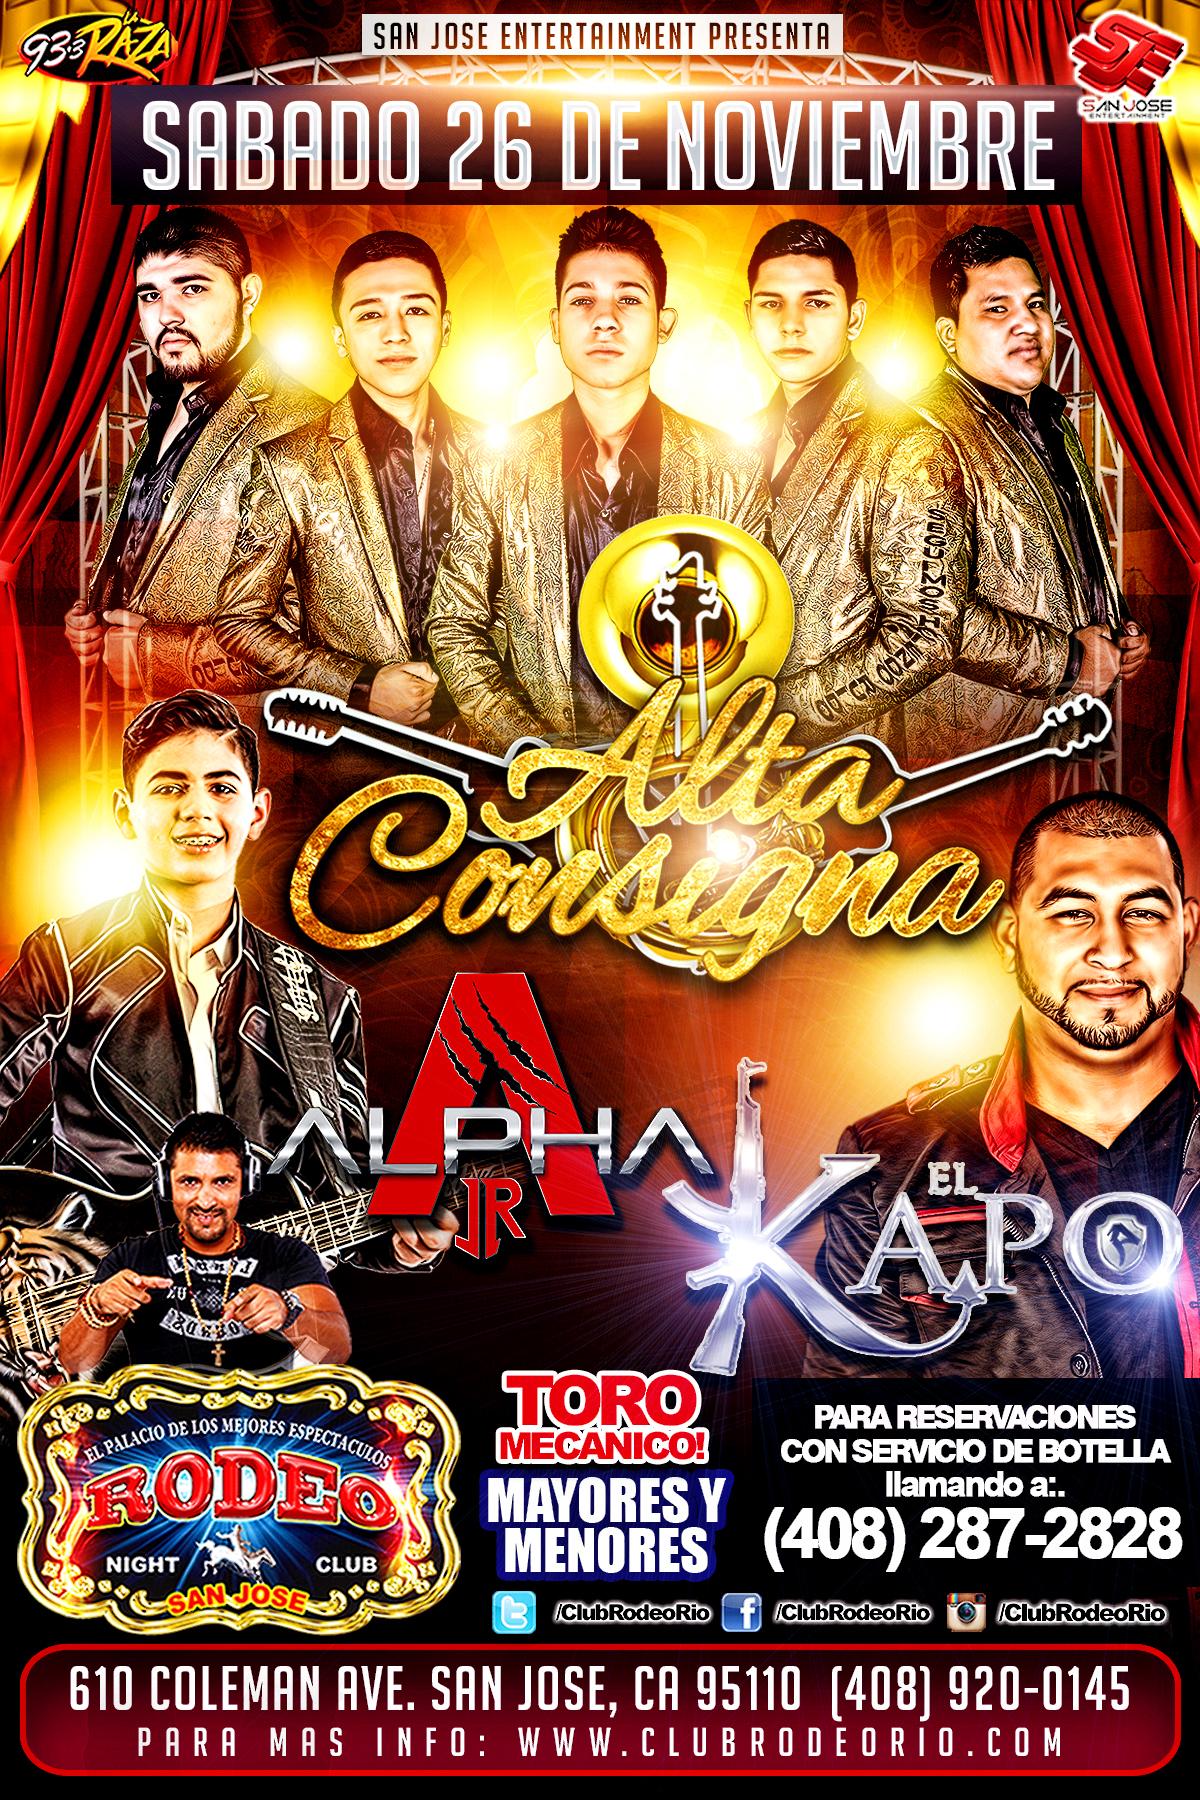 Alta Consigna Tickets The Rodeo Night Club On November